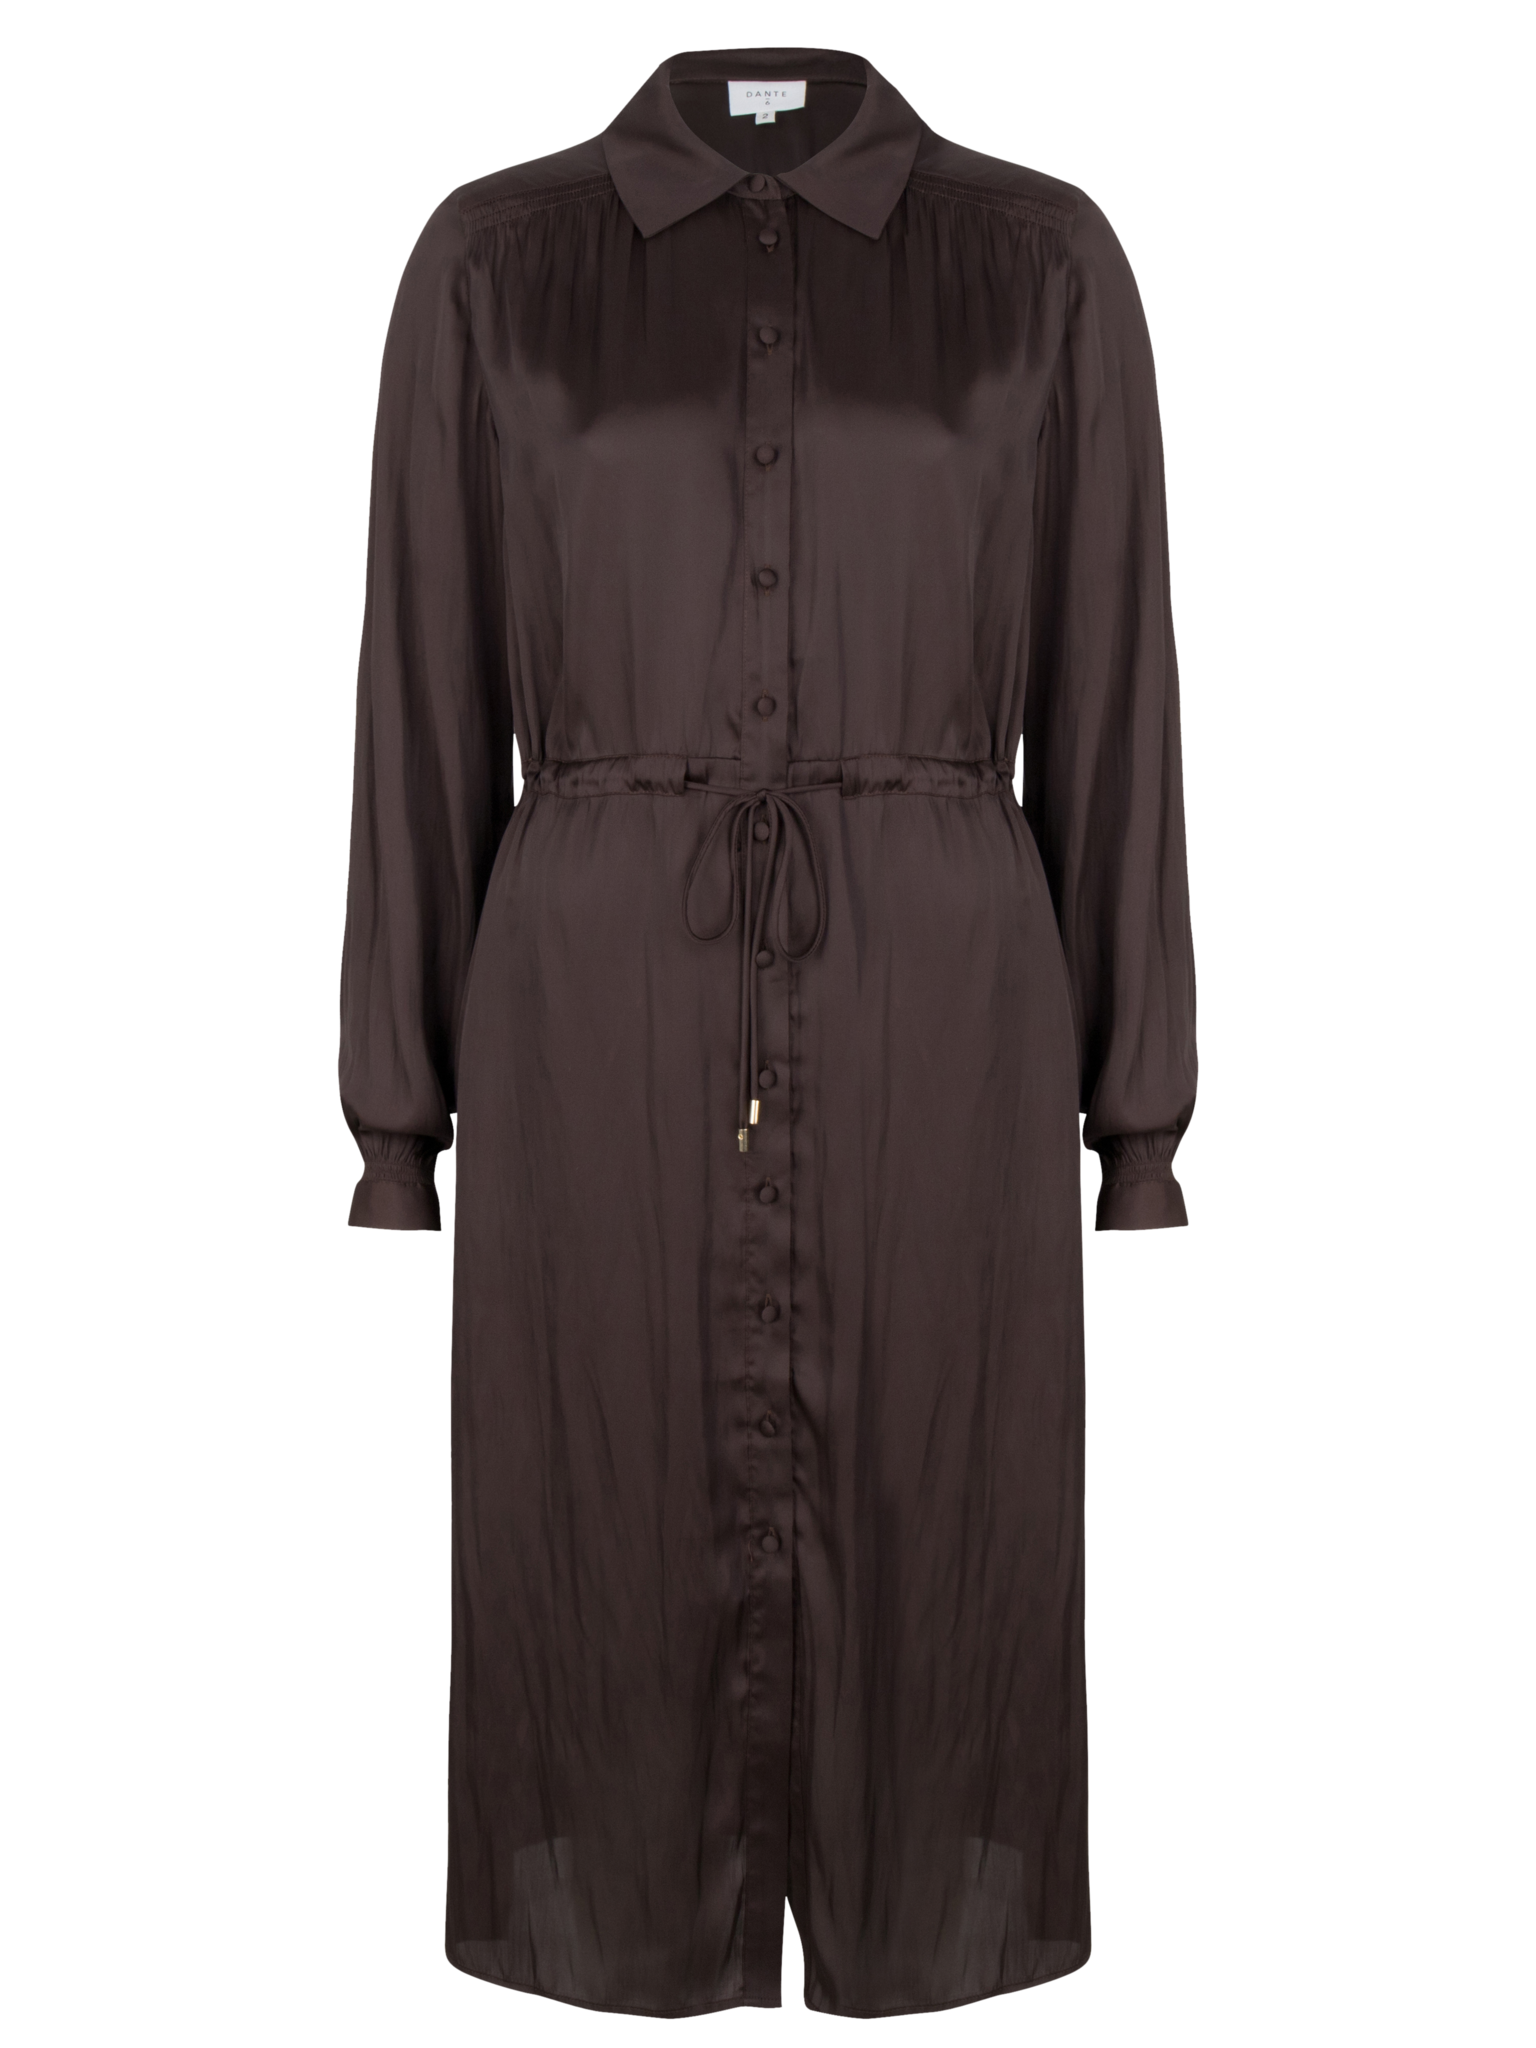 Dante 6 Dress 204104 DADALYN-1